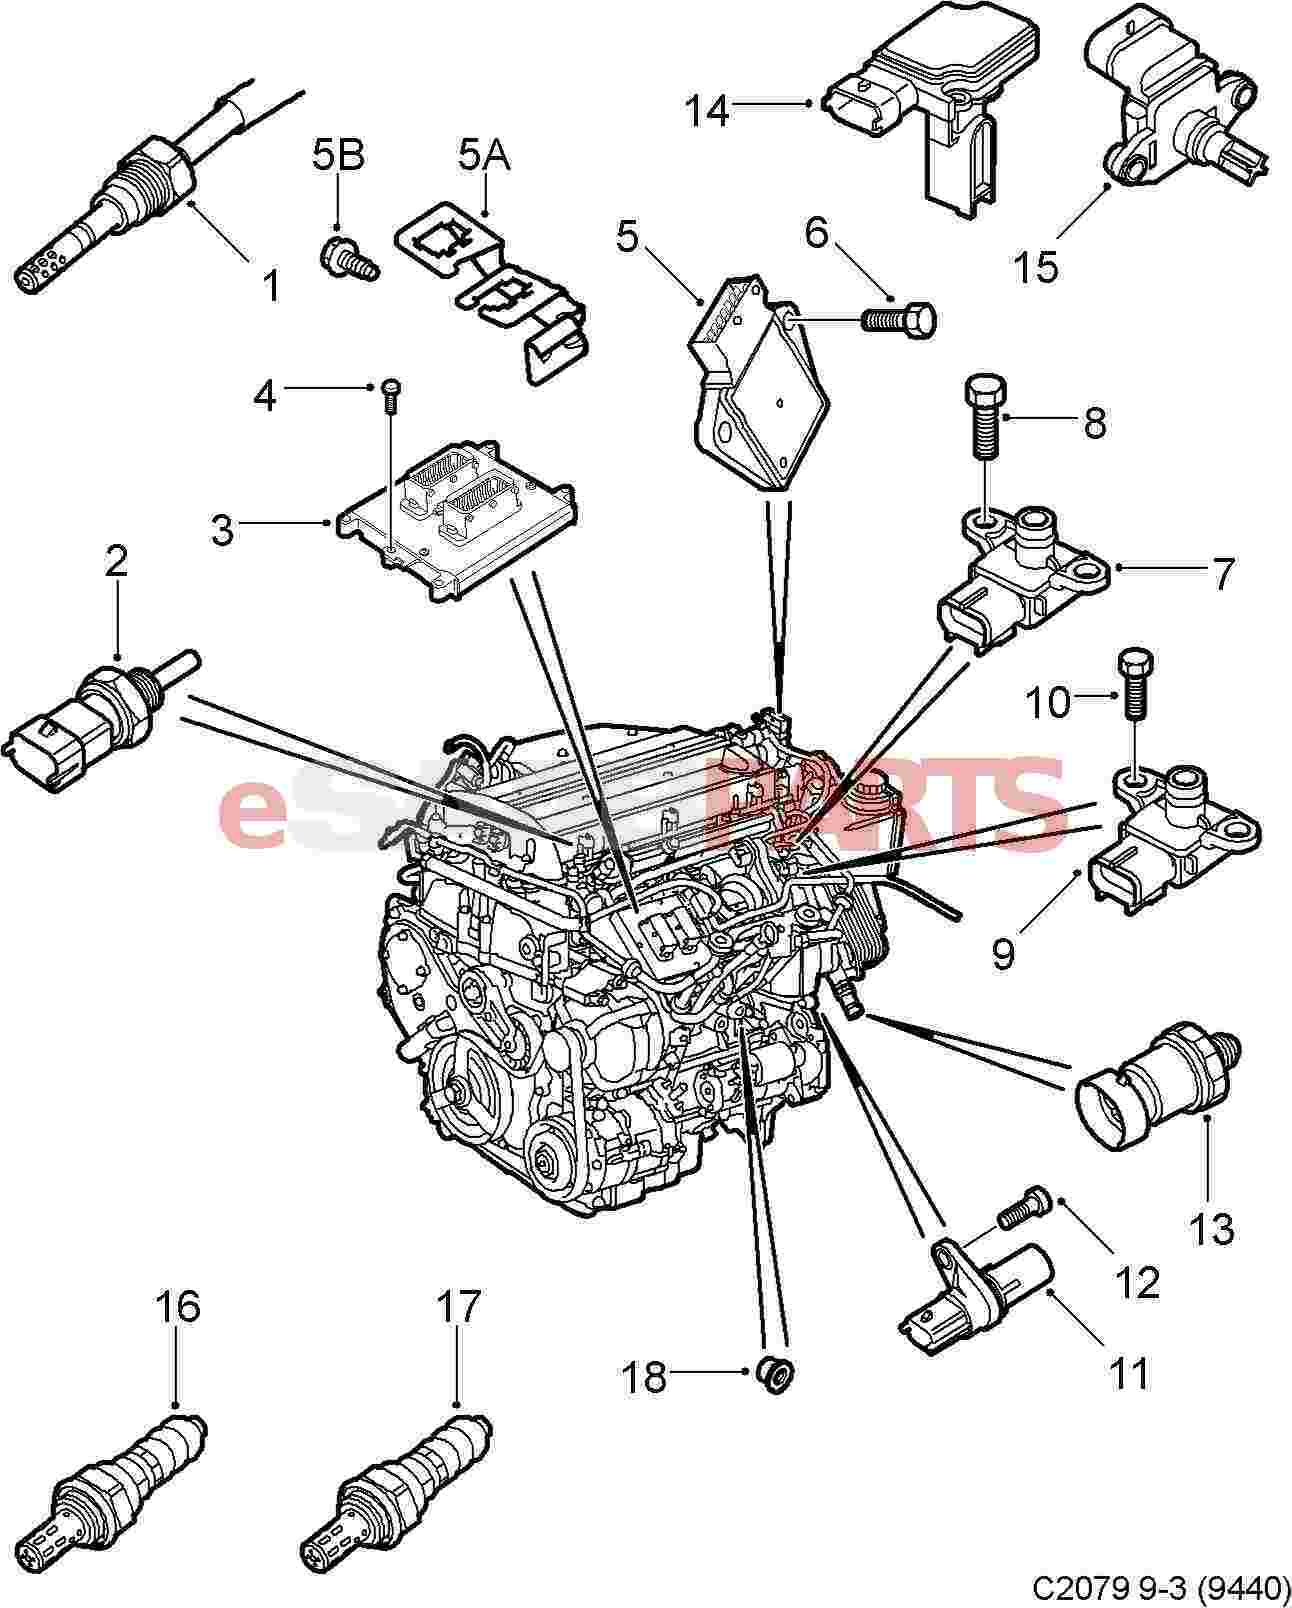 Saab 2 3 Engine Diagram Mazda Lights Wiring Diagram Begeboy Wiring Diagram Source